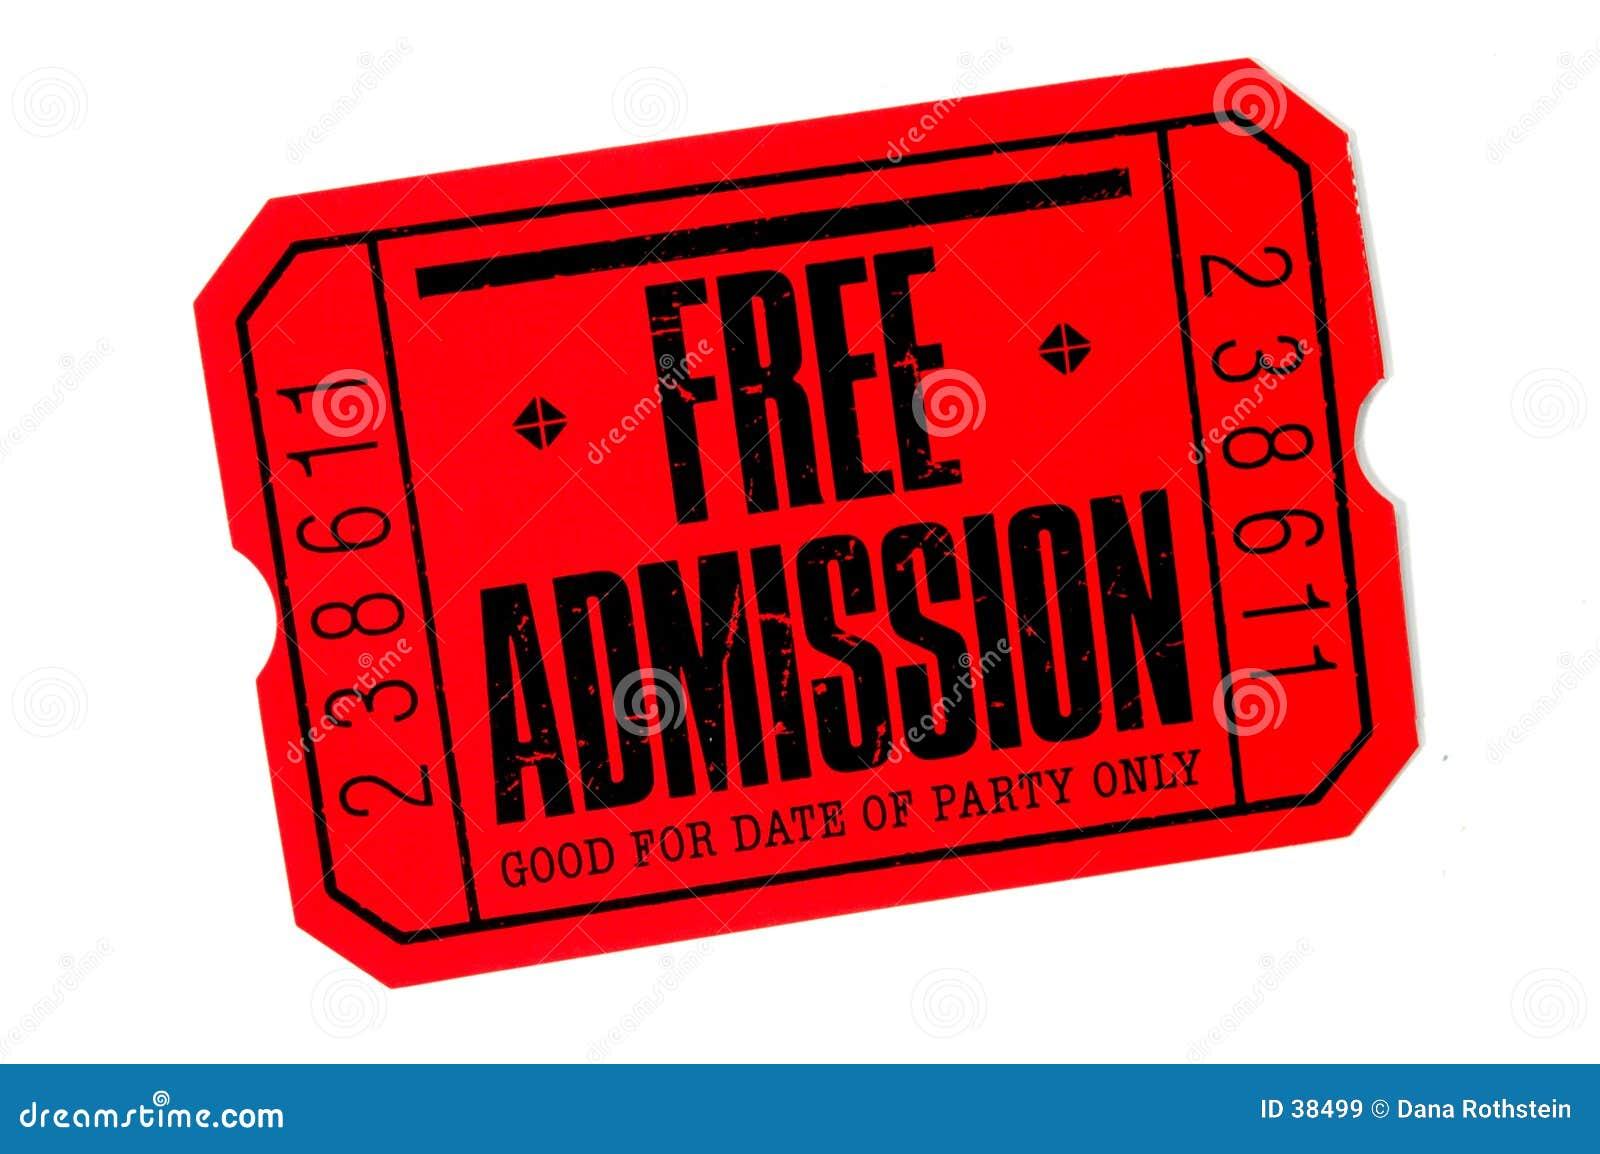 ticket free - Gecce.tackletarts.co